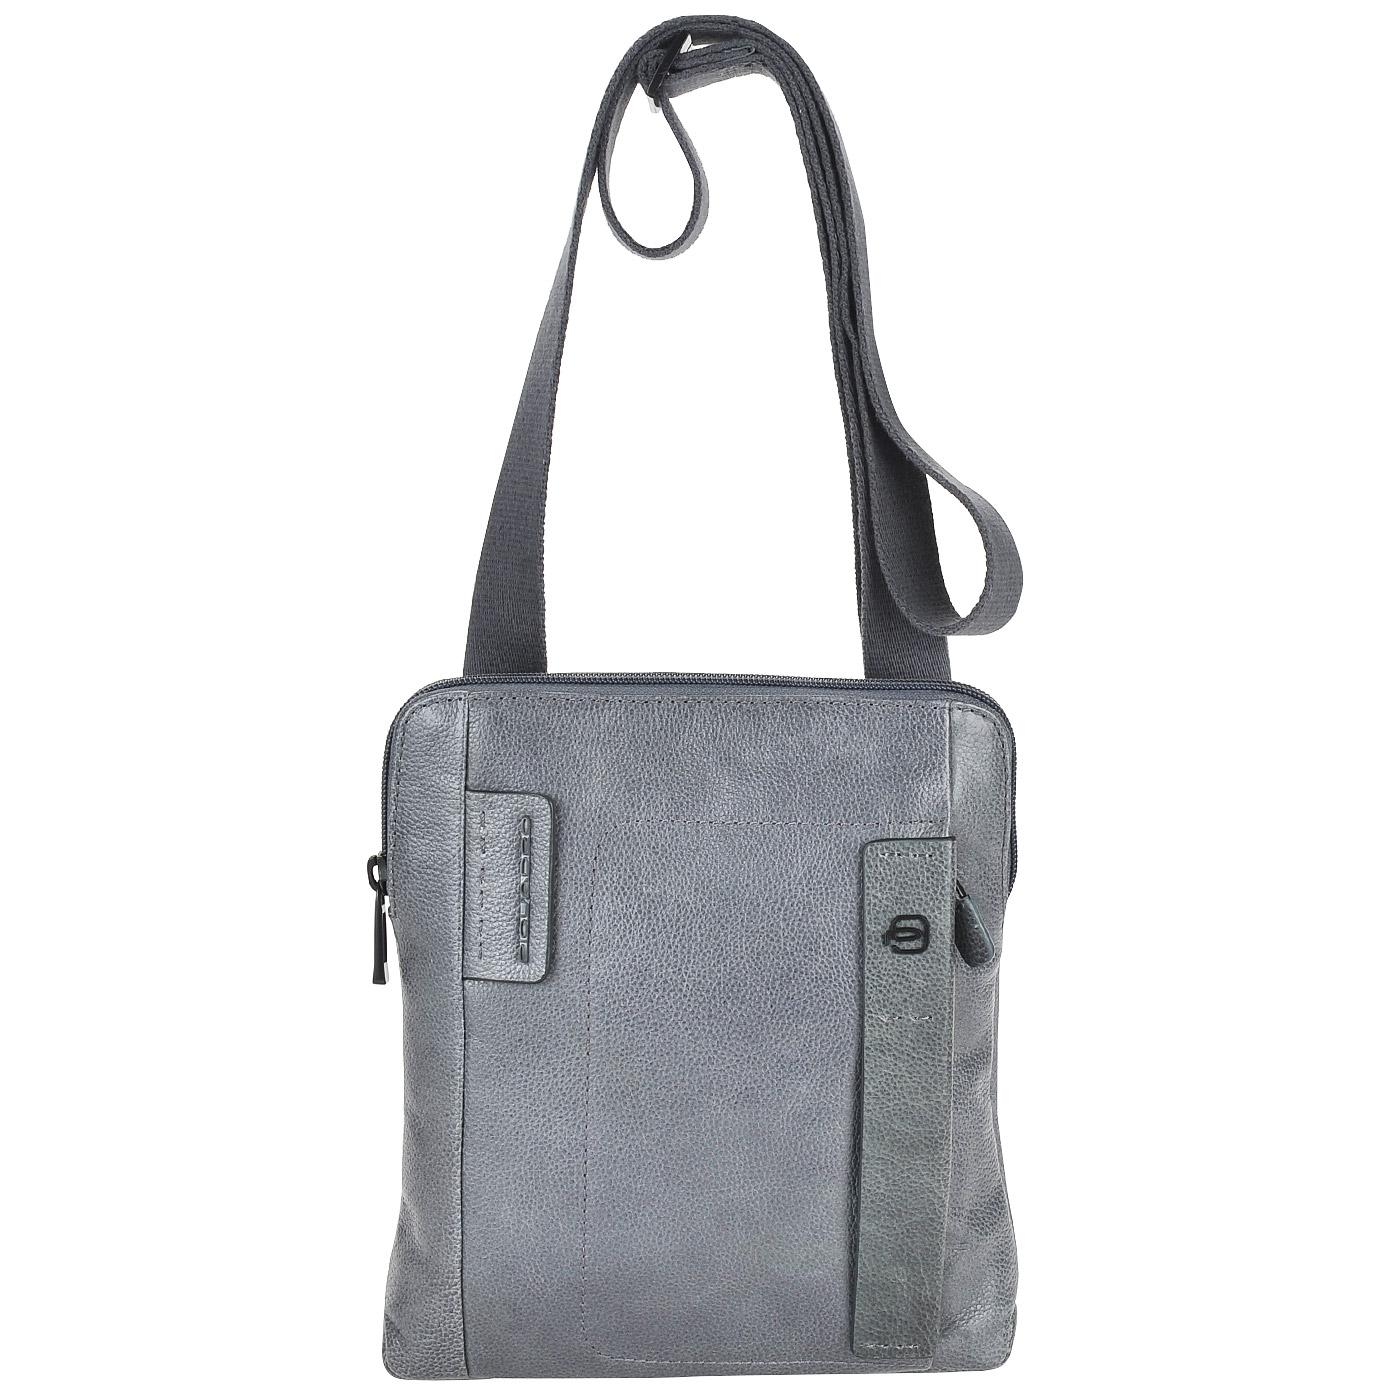 ec6d16775229 Мужская сумка через плечо Piquadro Plus CA1358P15S/GR ...